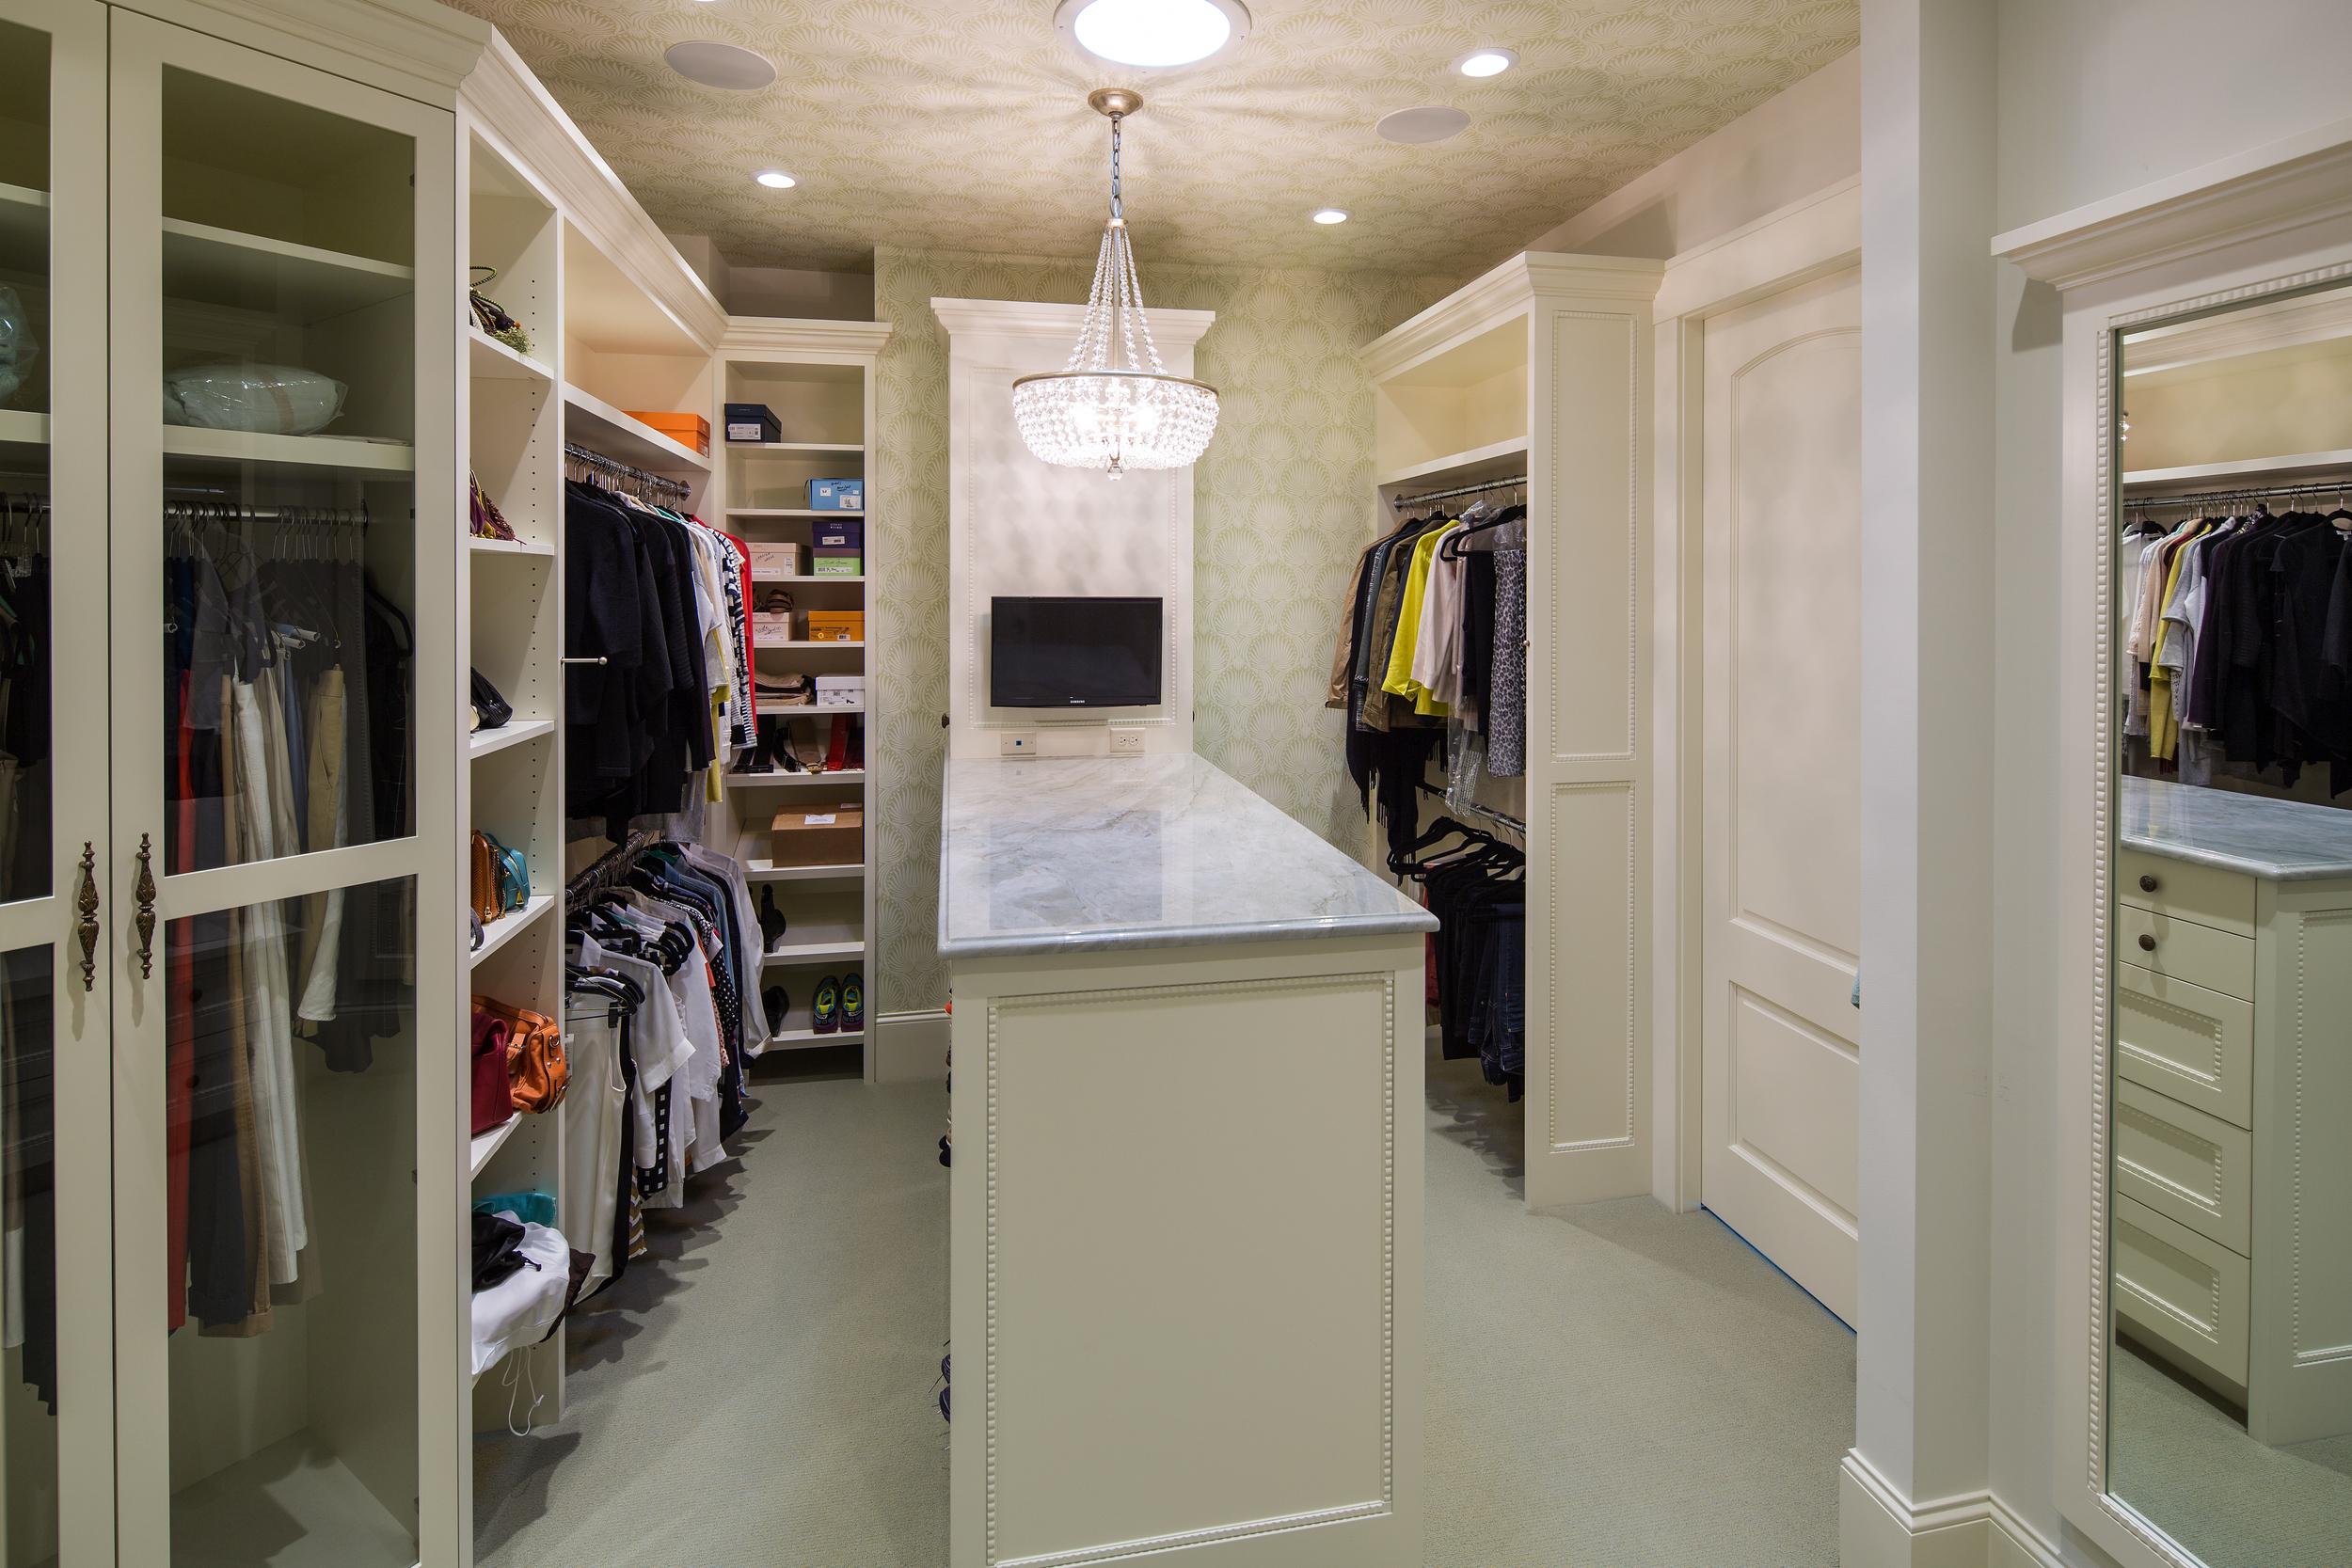 Mrs.closet.jpg